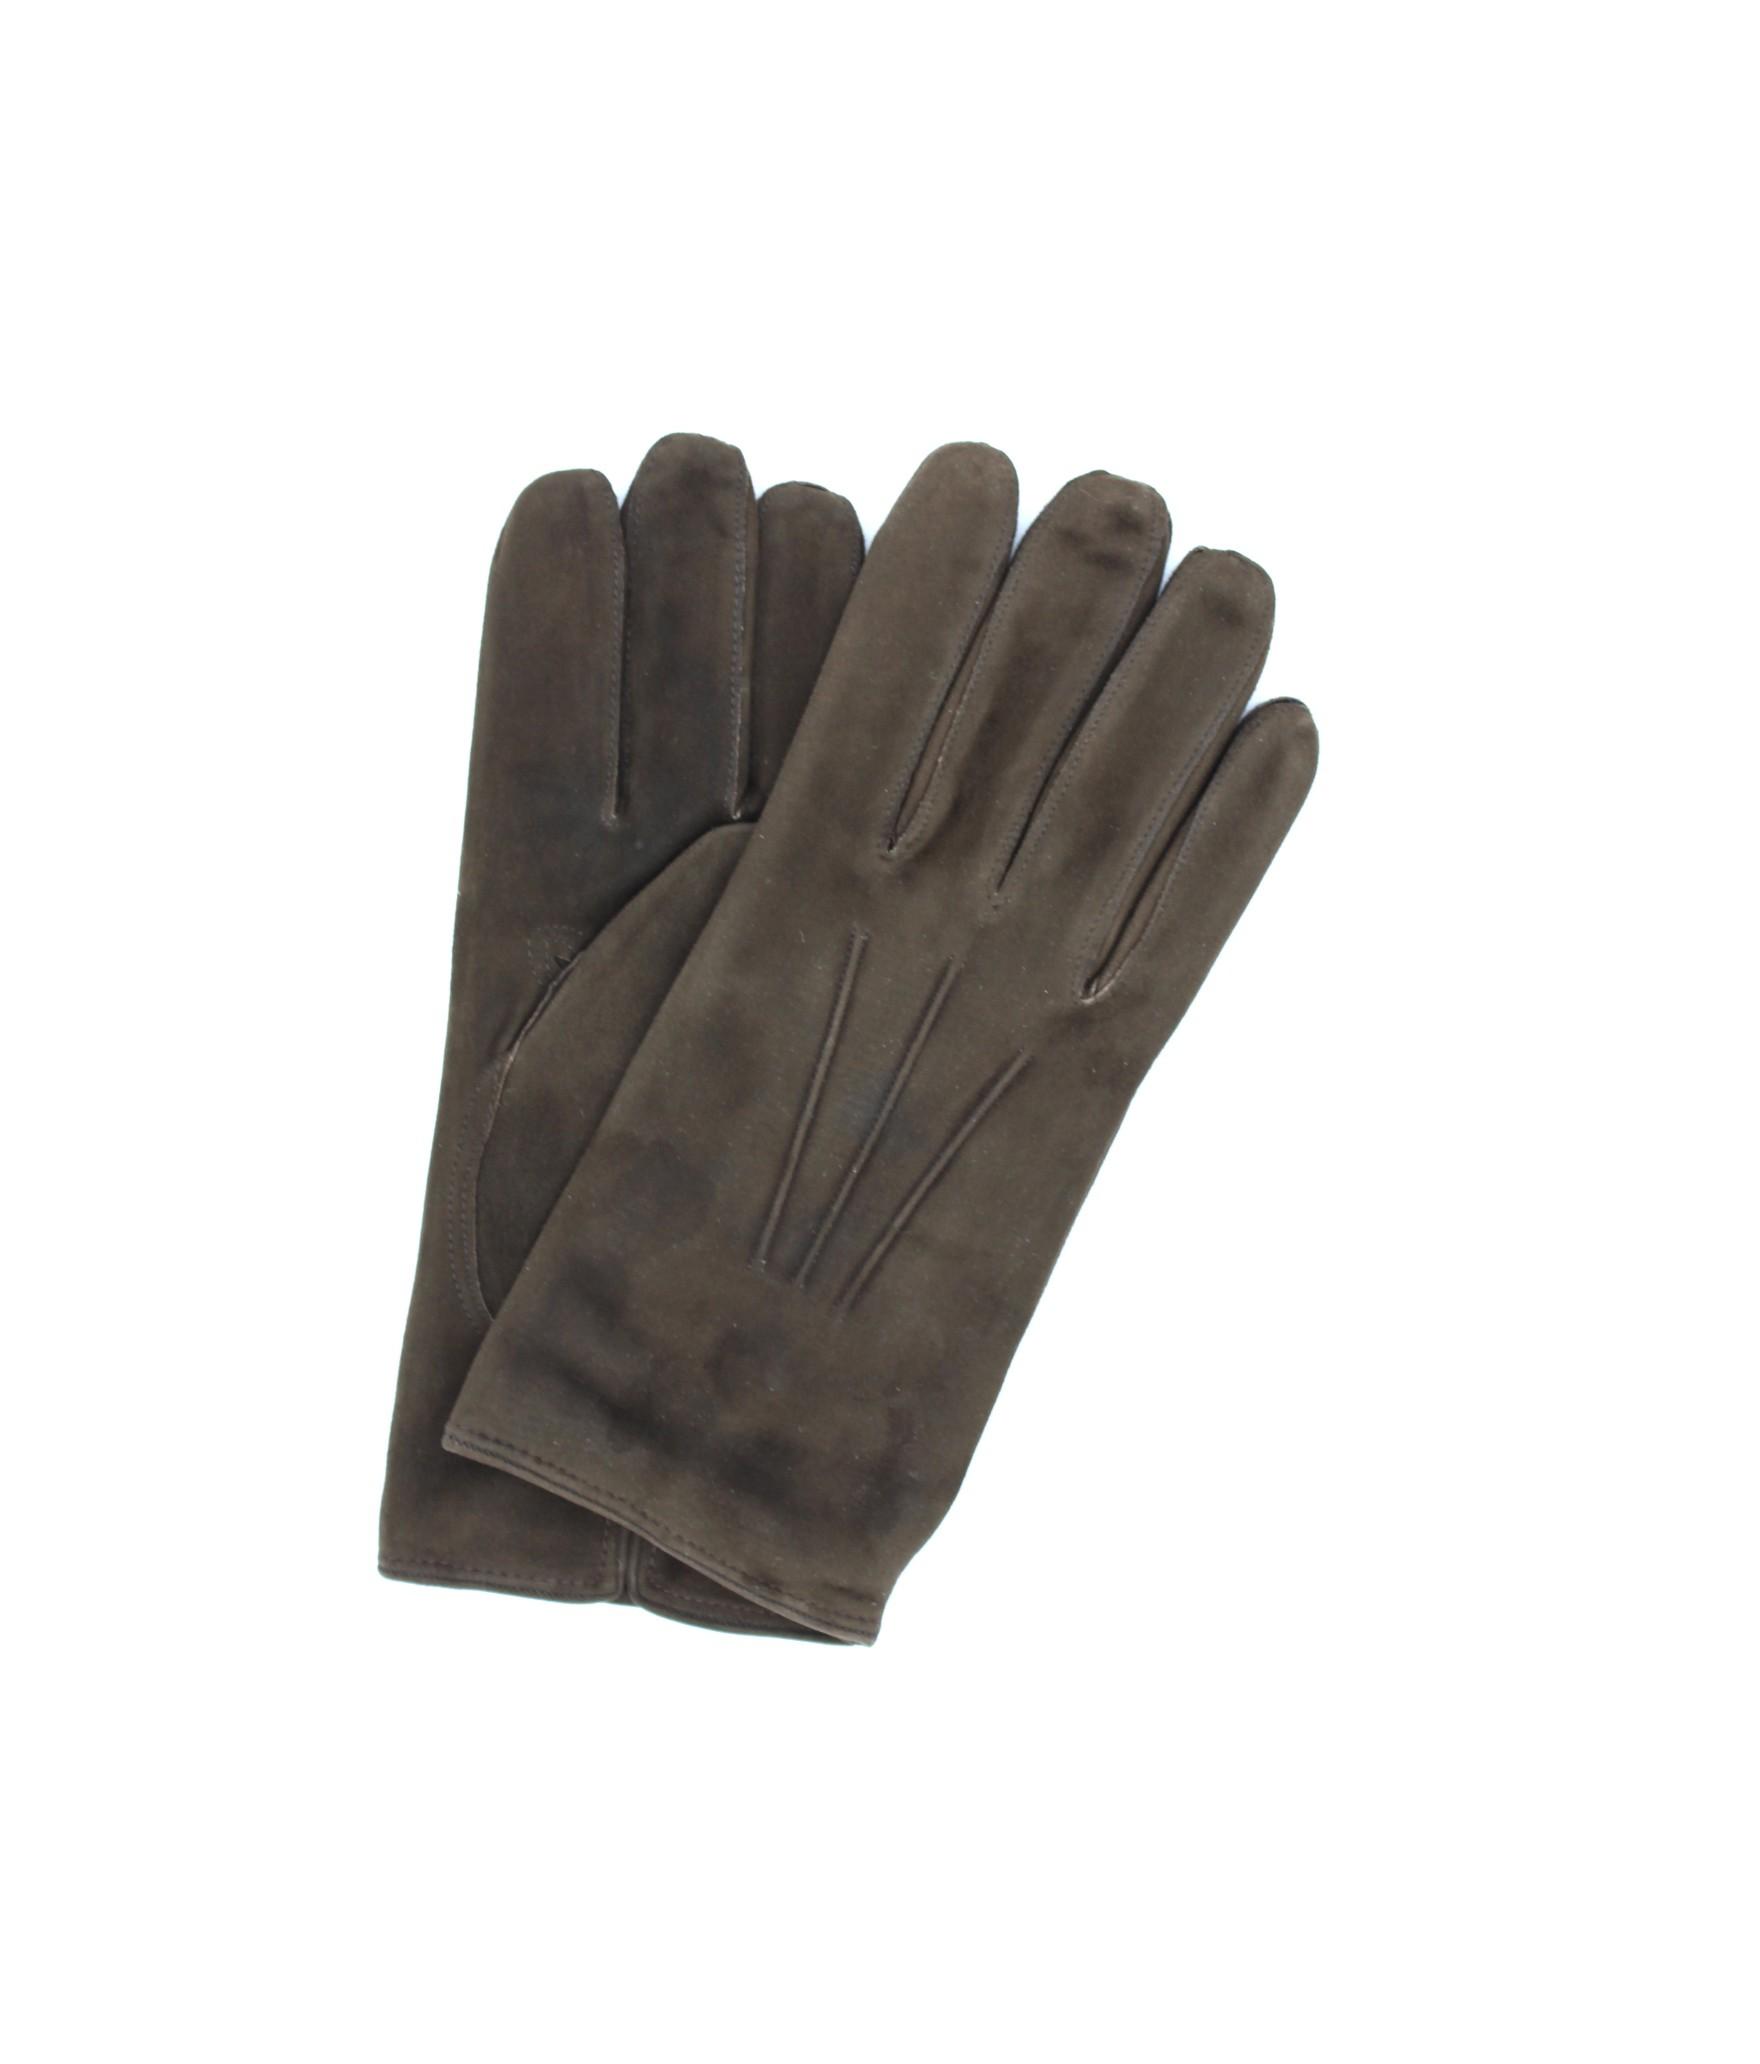 Suede Nappa leather gloves cashmere lined Dark Brown Sermoneta